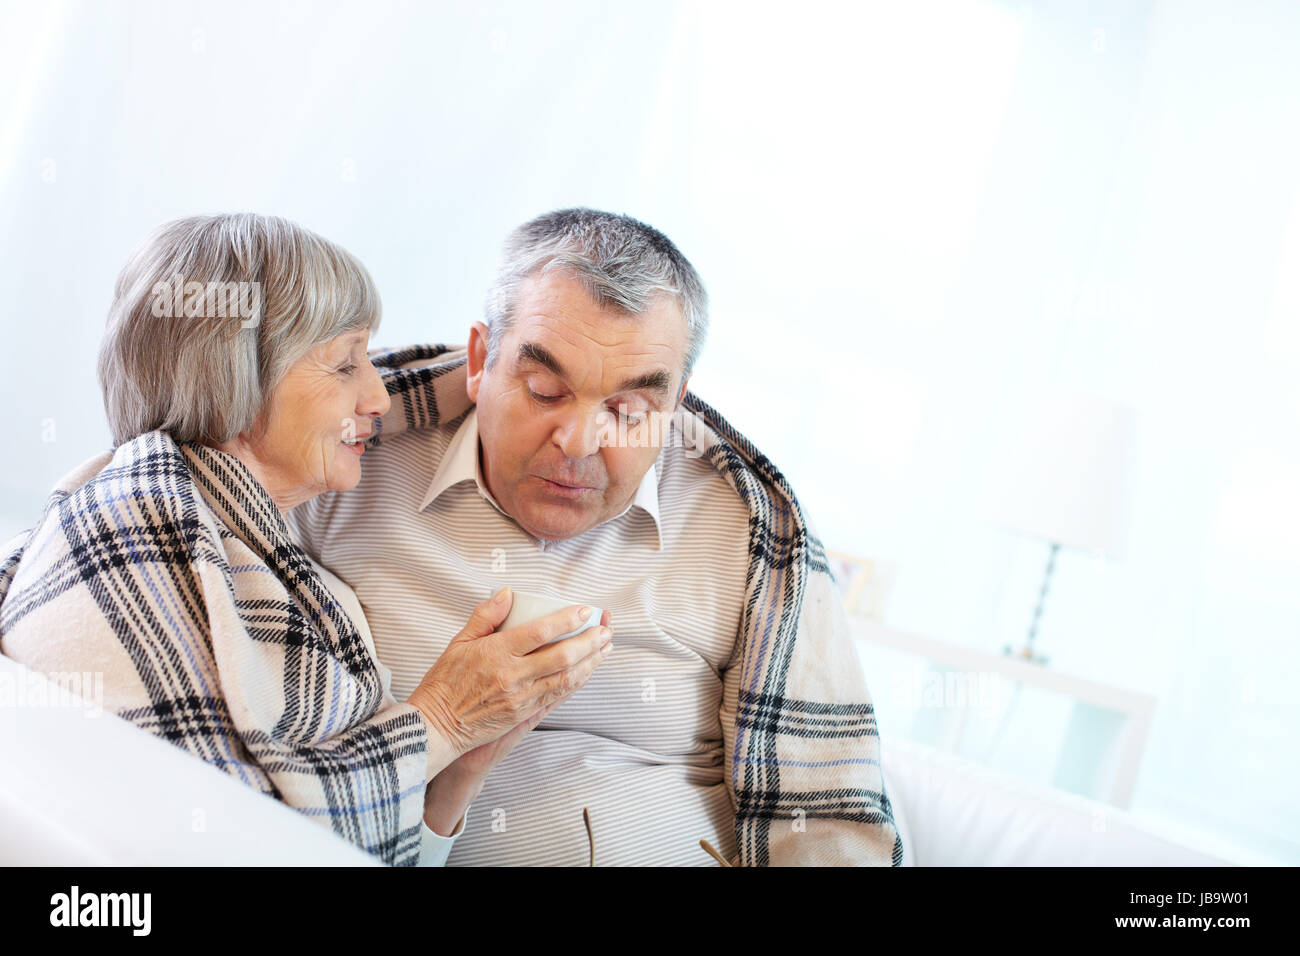 Senior woman giving hot tea to her senior husband - Stock Image